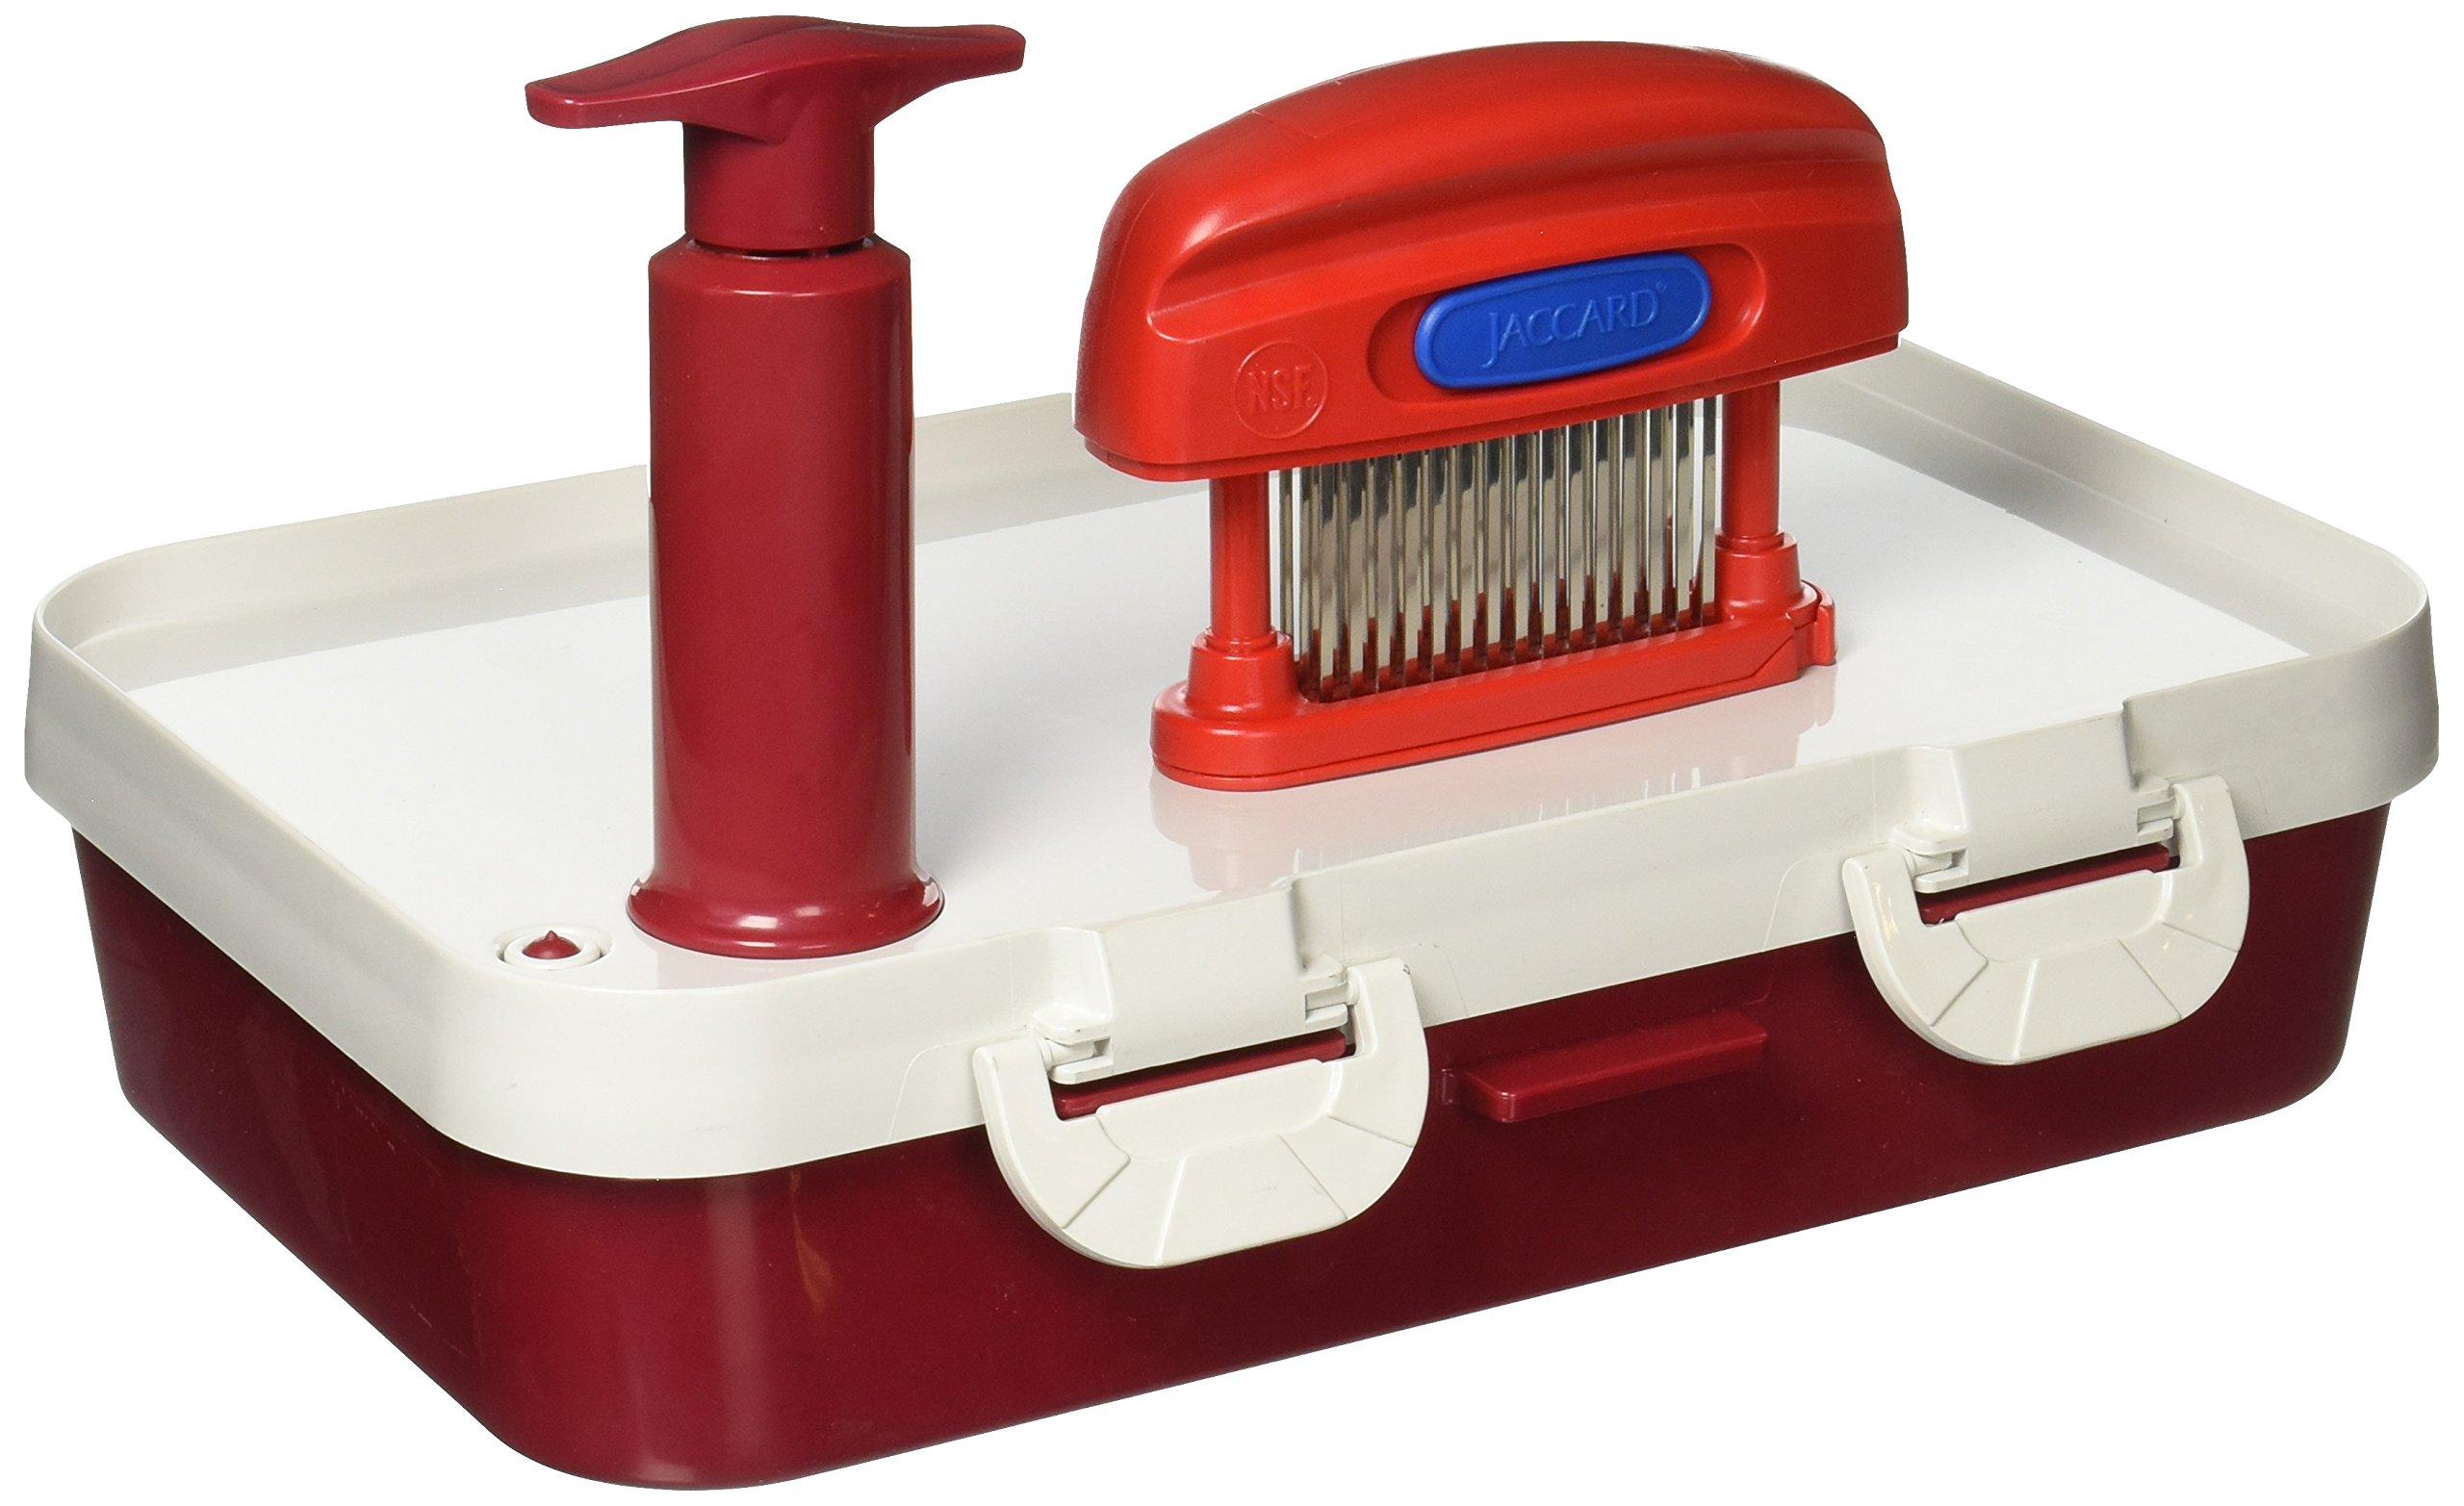 Jaccard Speedy Plus Ultimate Instant Marinater Kit, 15 Knife Meat Tenderizer PLUS Speedy Plus Instant Marinater, 10 by 14'', Red/White by Jaccard